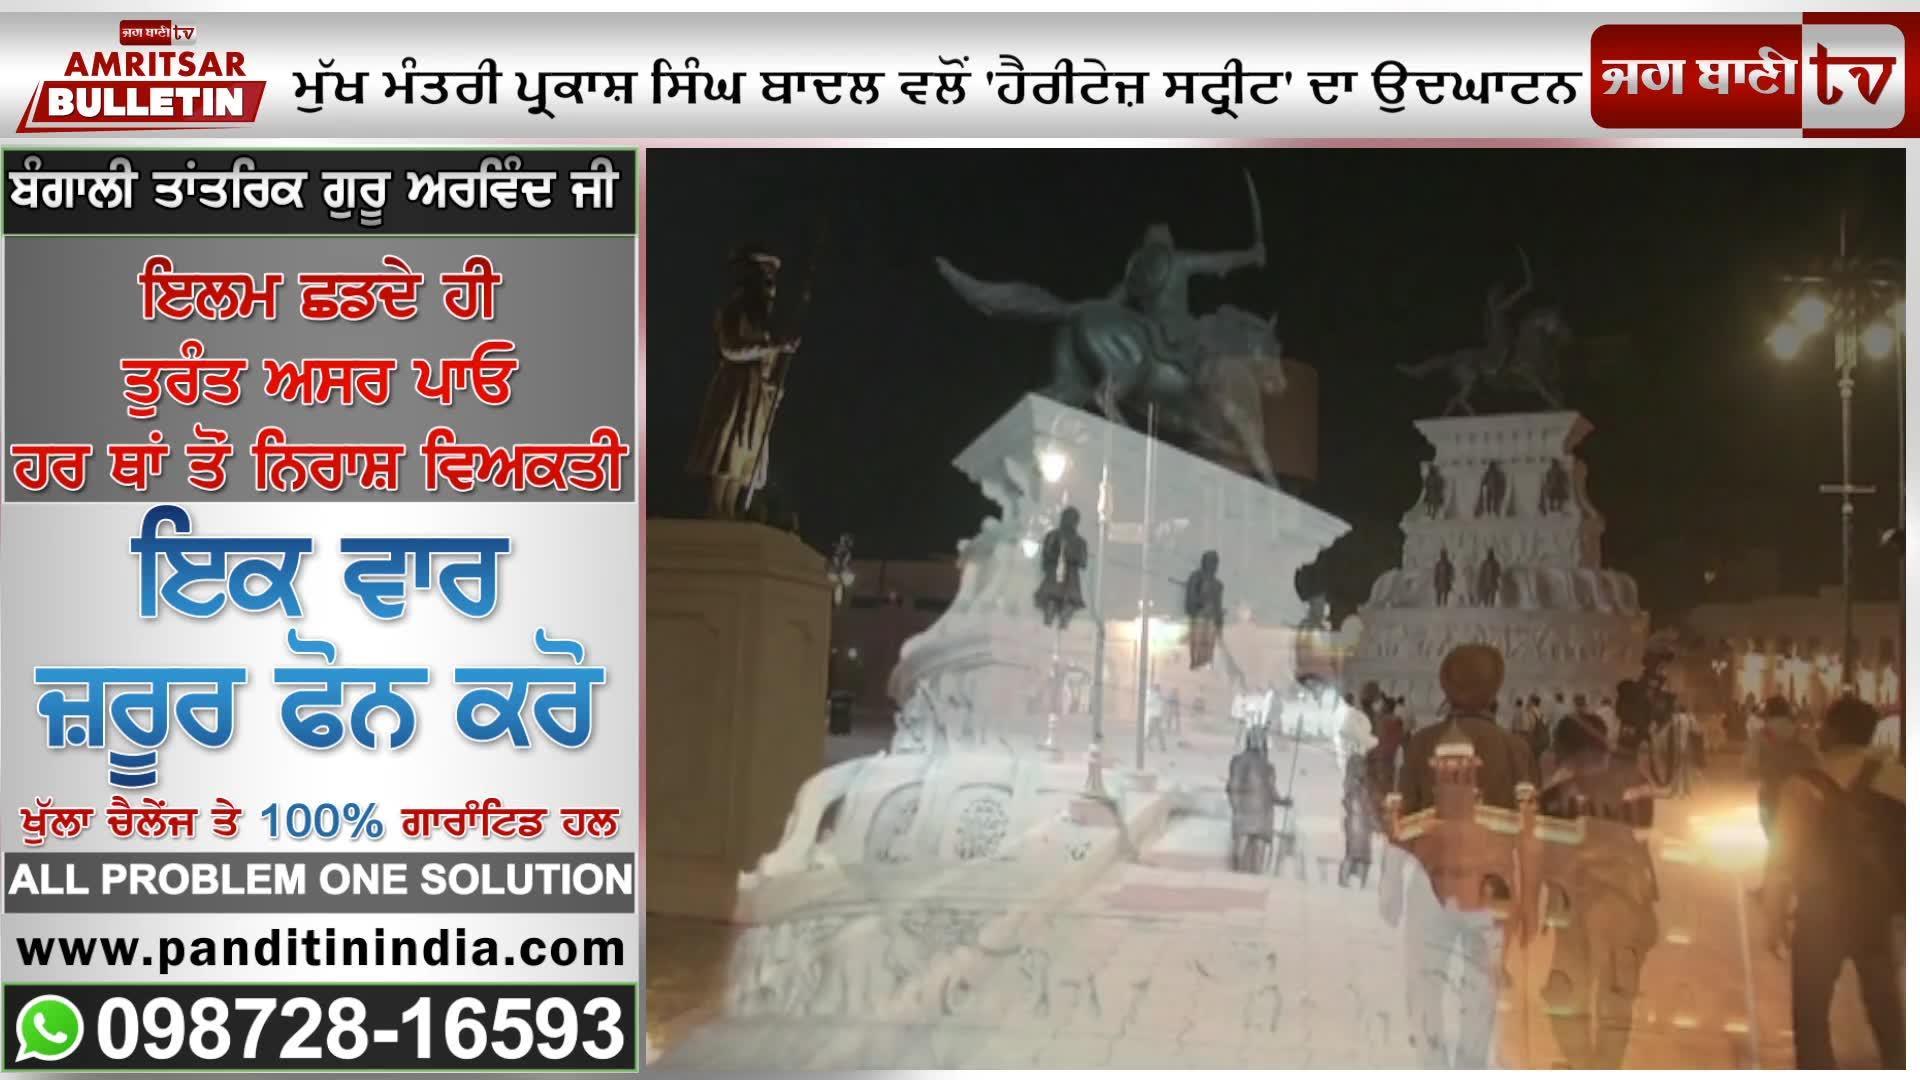 Image of Watch Amritsar Bulletin : ਮੁੱਖ ਮੰਤਰੀ ਪ੍ਰਕਾਸ਼ ਸਿੰਘ ਬਾਦਲ ਵਲੋਂ 'ਹੈਰੀਟੇਜ਼ ਸਟ੍ਰੀਟ' ਦਾ ਉਦਘਾਟਨ